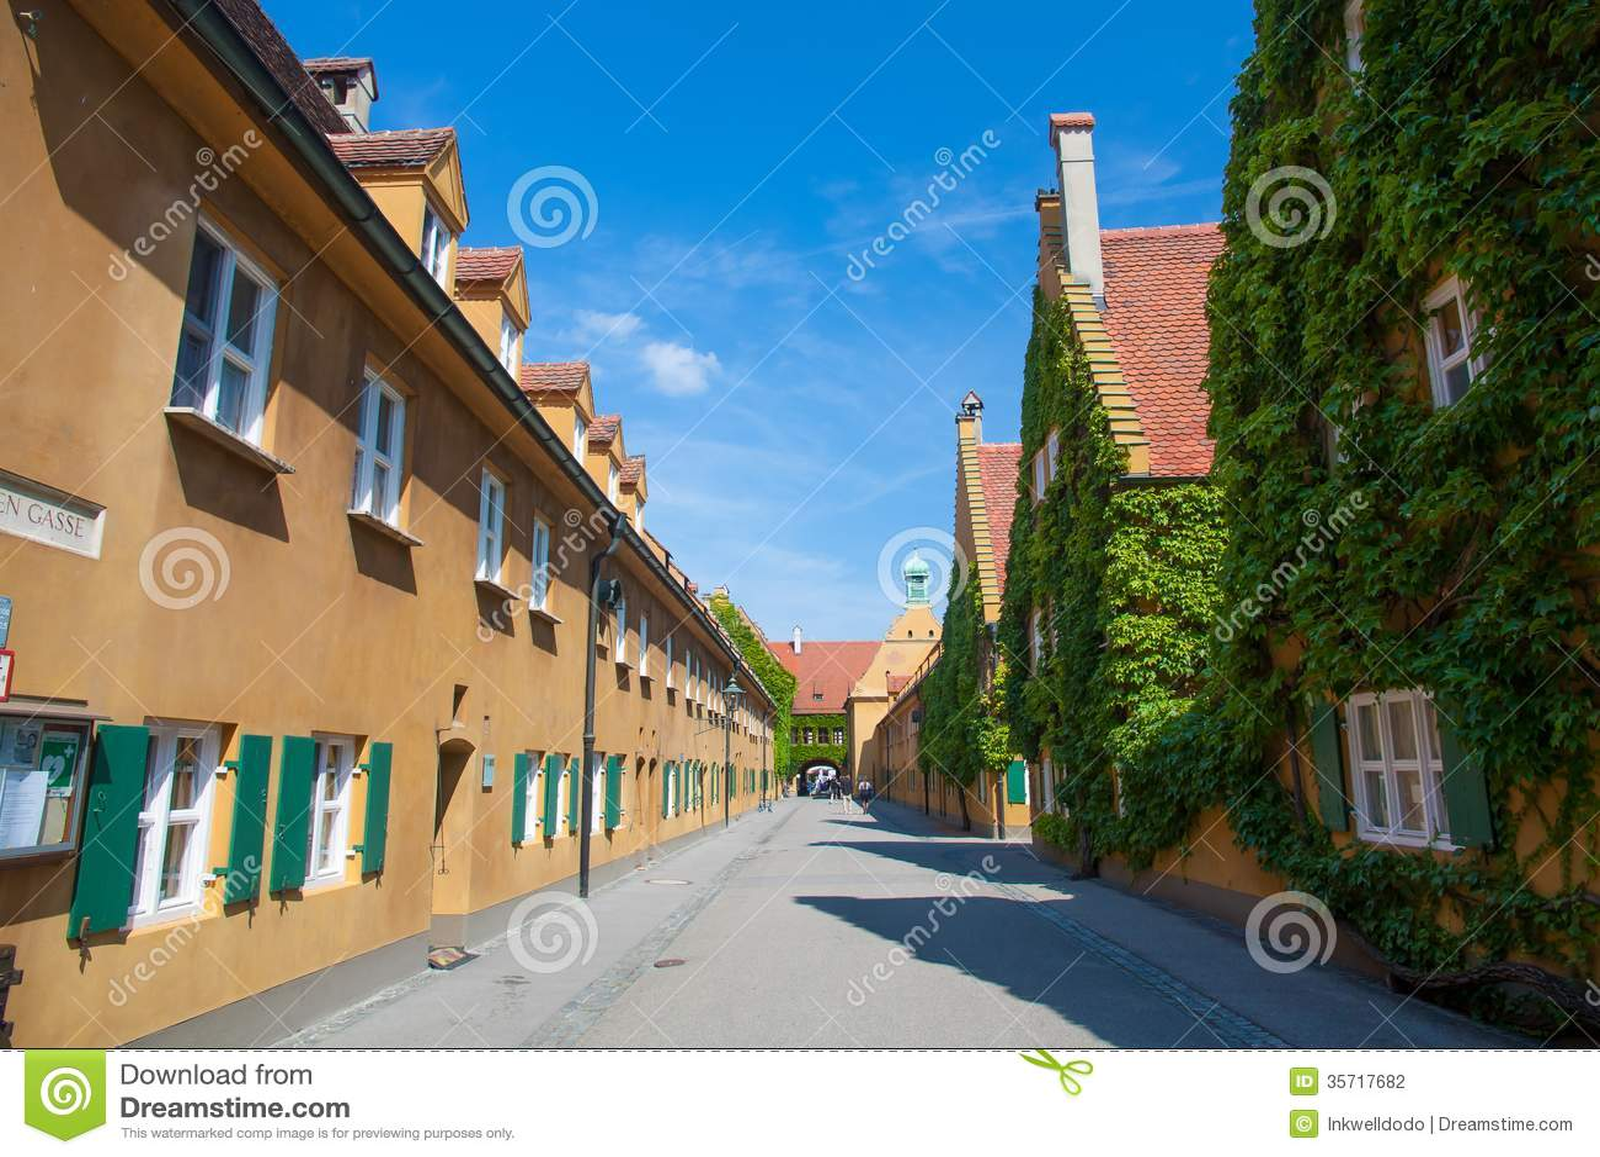 fuggerei augsburg deutschland stockfoto bild 35717682. Black Bedroom Furniture Sets. Home Design Ideas